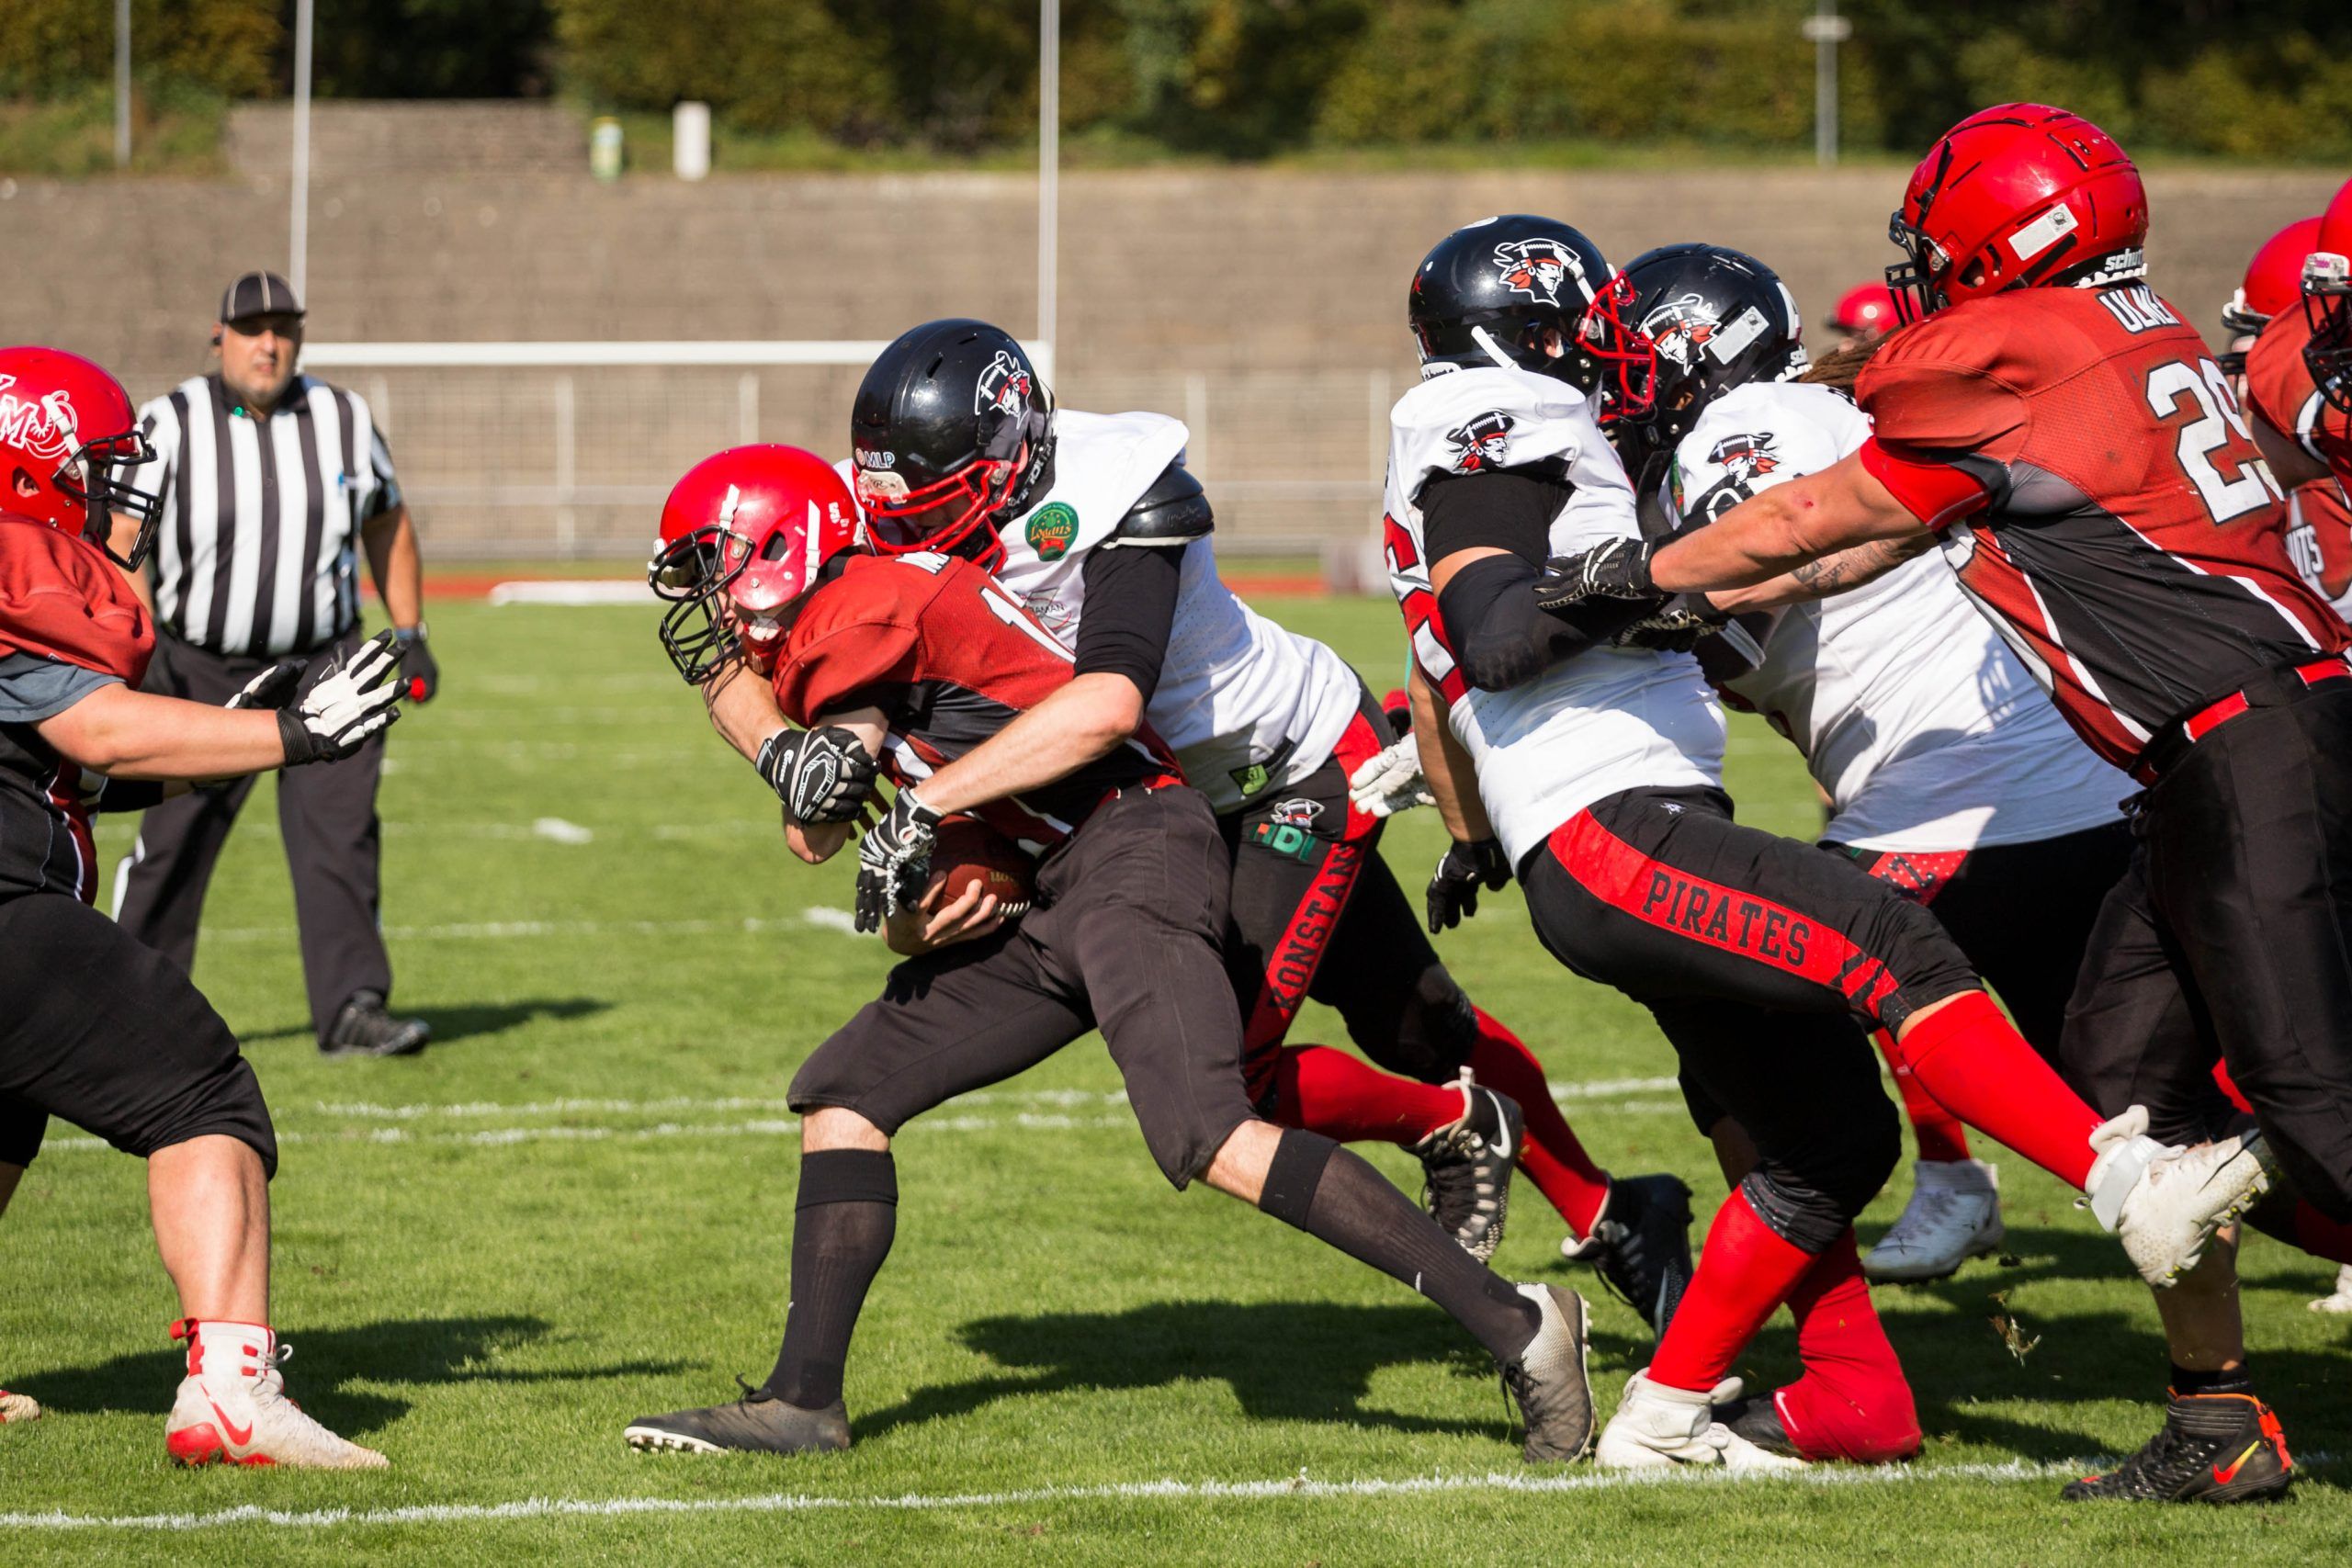 Konstanz Pirates - American Football - Kuchen II